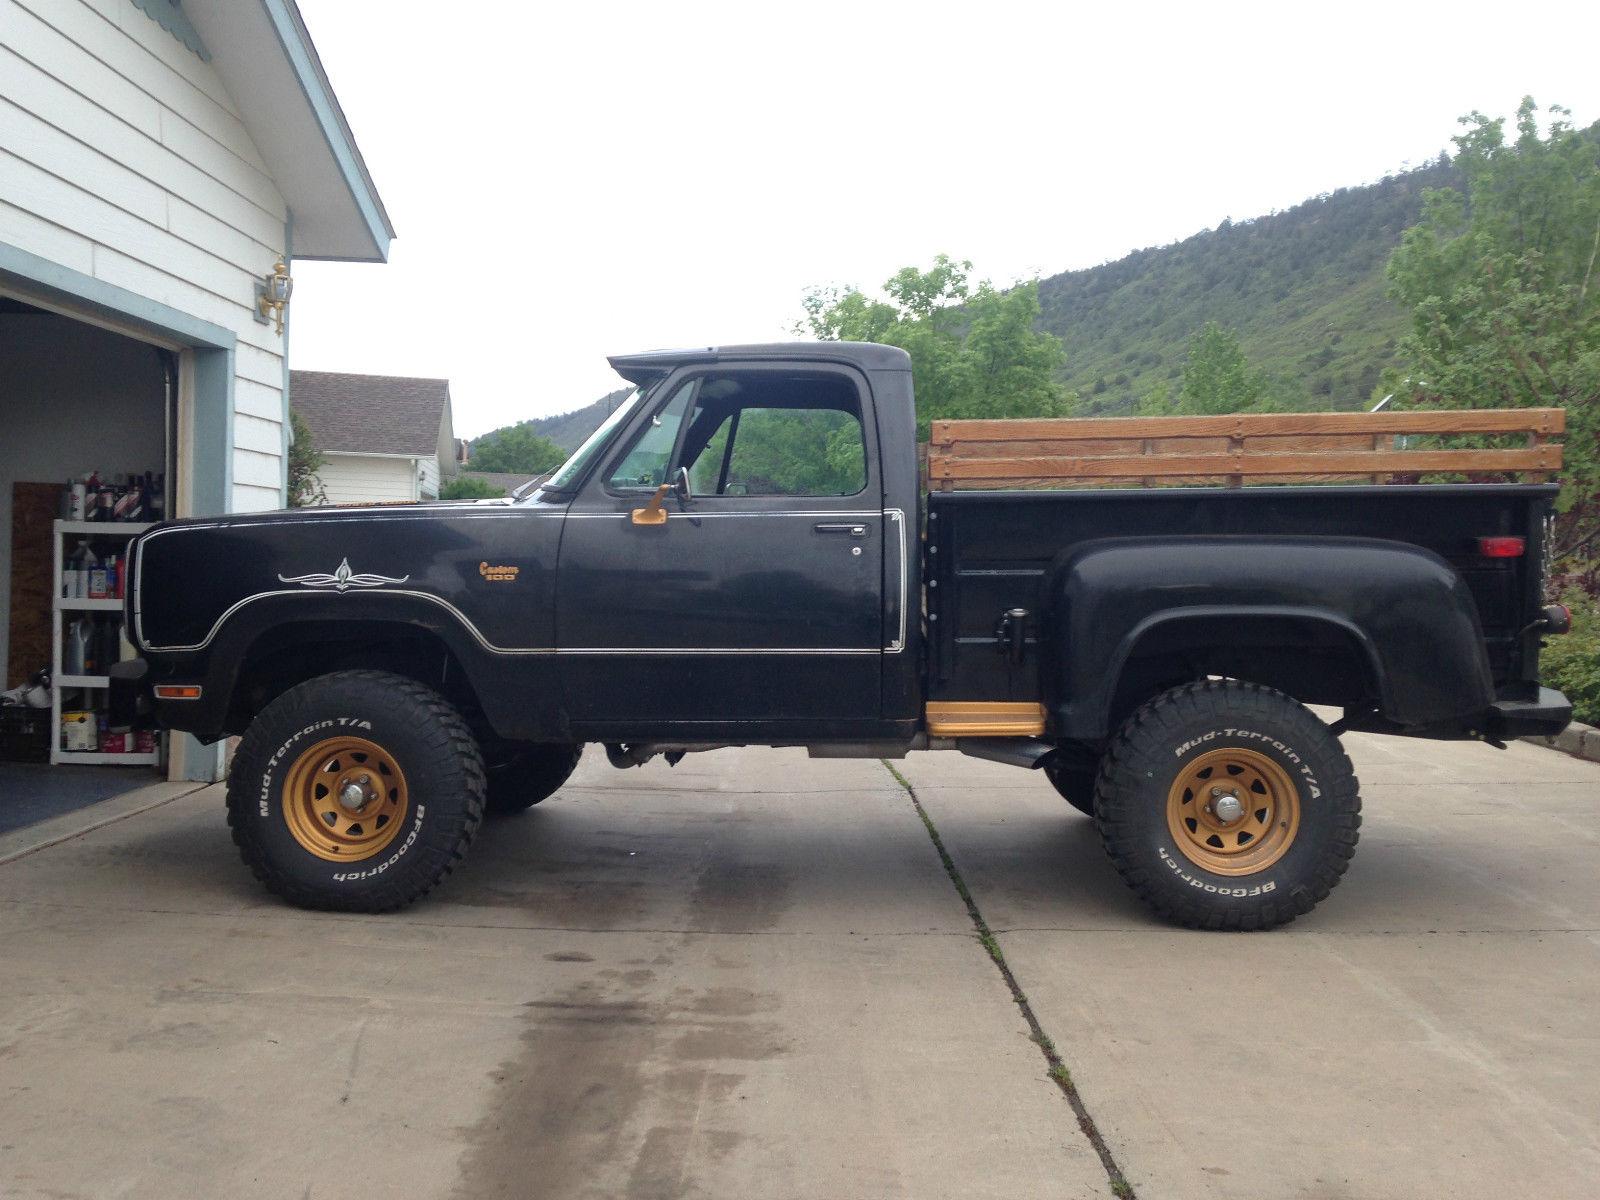 1976 Dodge Warlock For Sale In Bayfield Colorado United